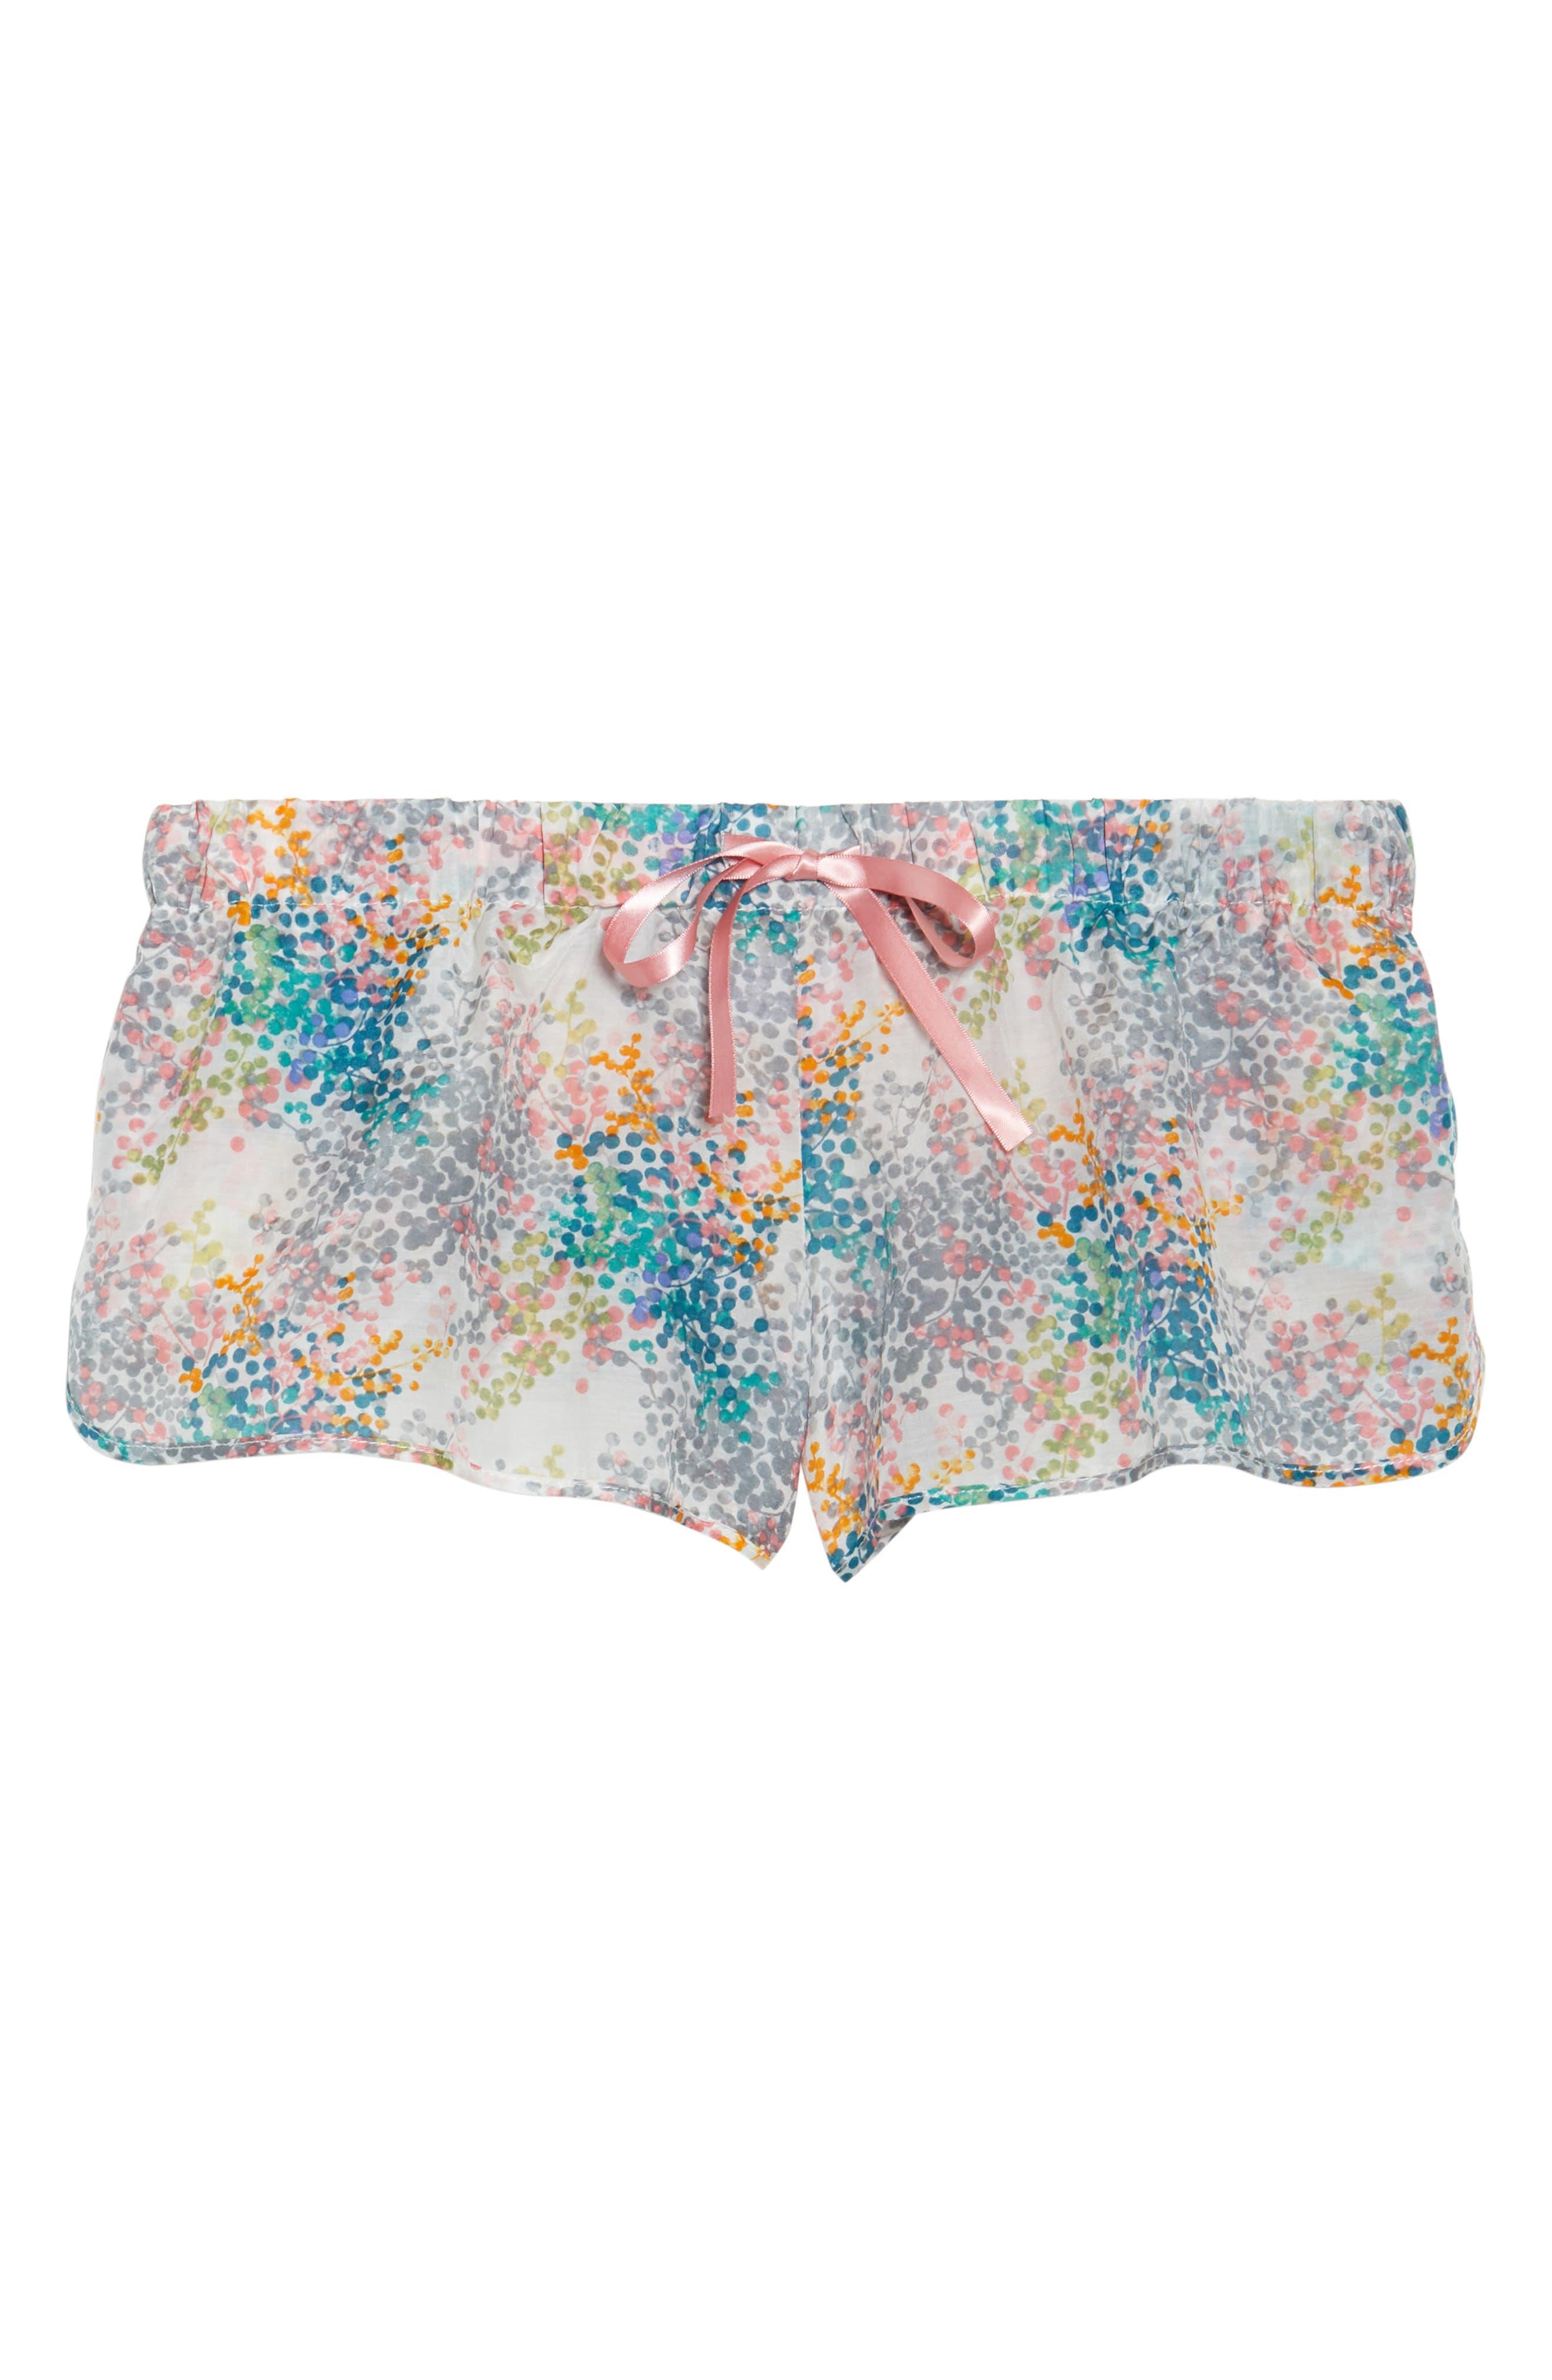 Bouquet Pajama Shorts,                             Alternate thumbnail 6, color,                             BLUE GREEN